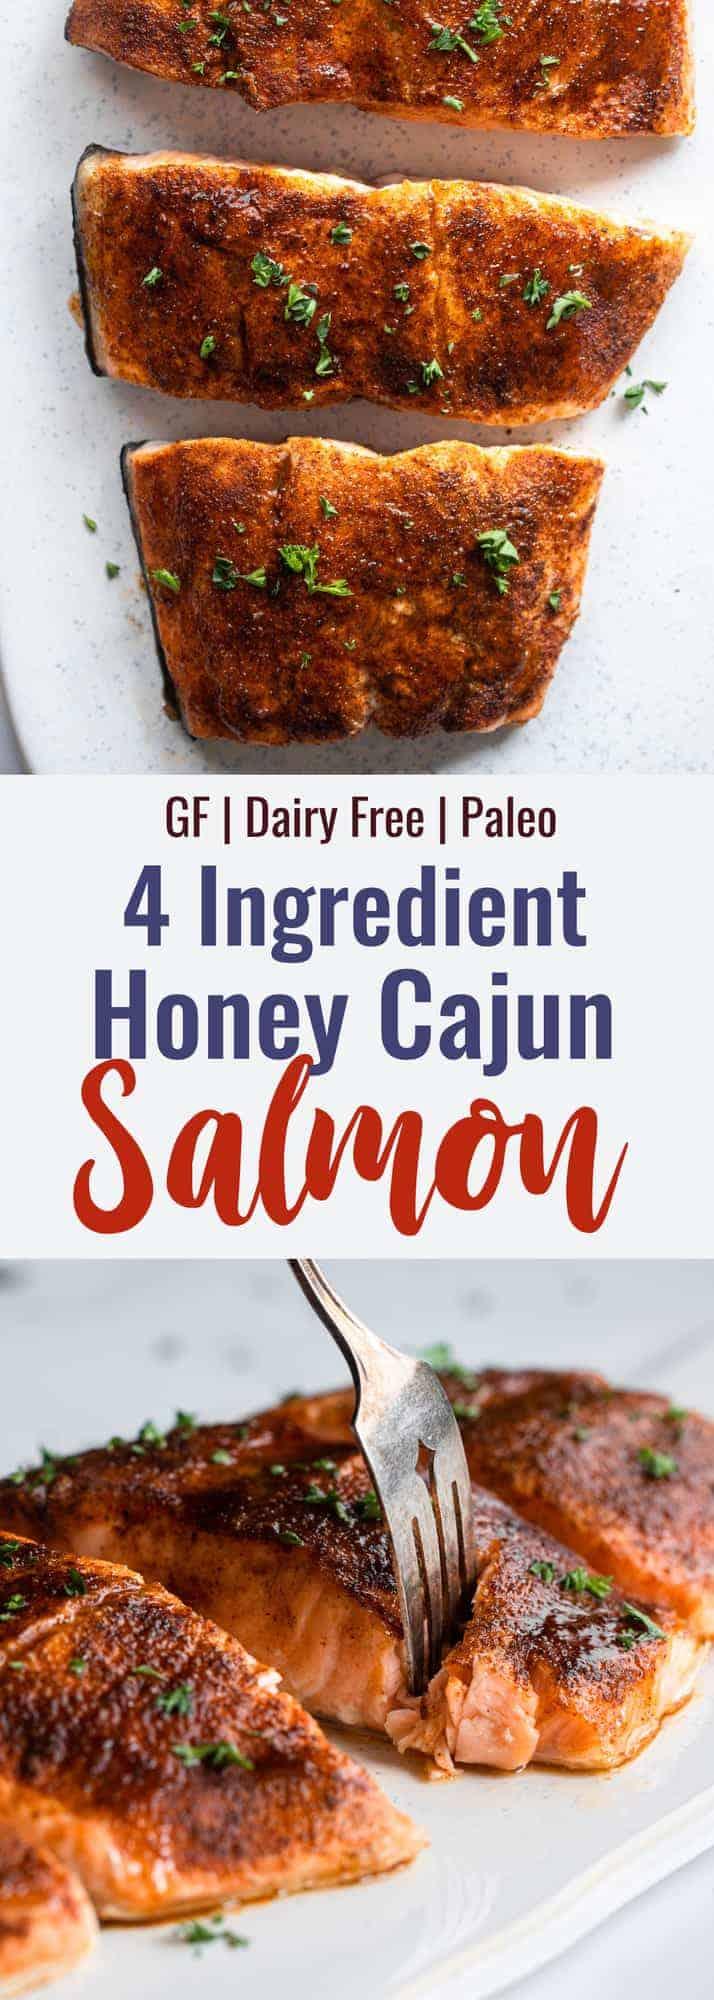 Honey Cajun Salmon collage photo